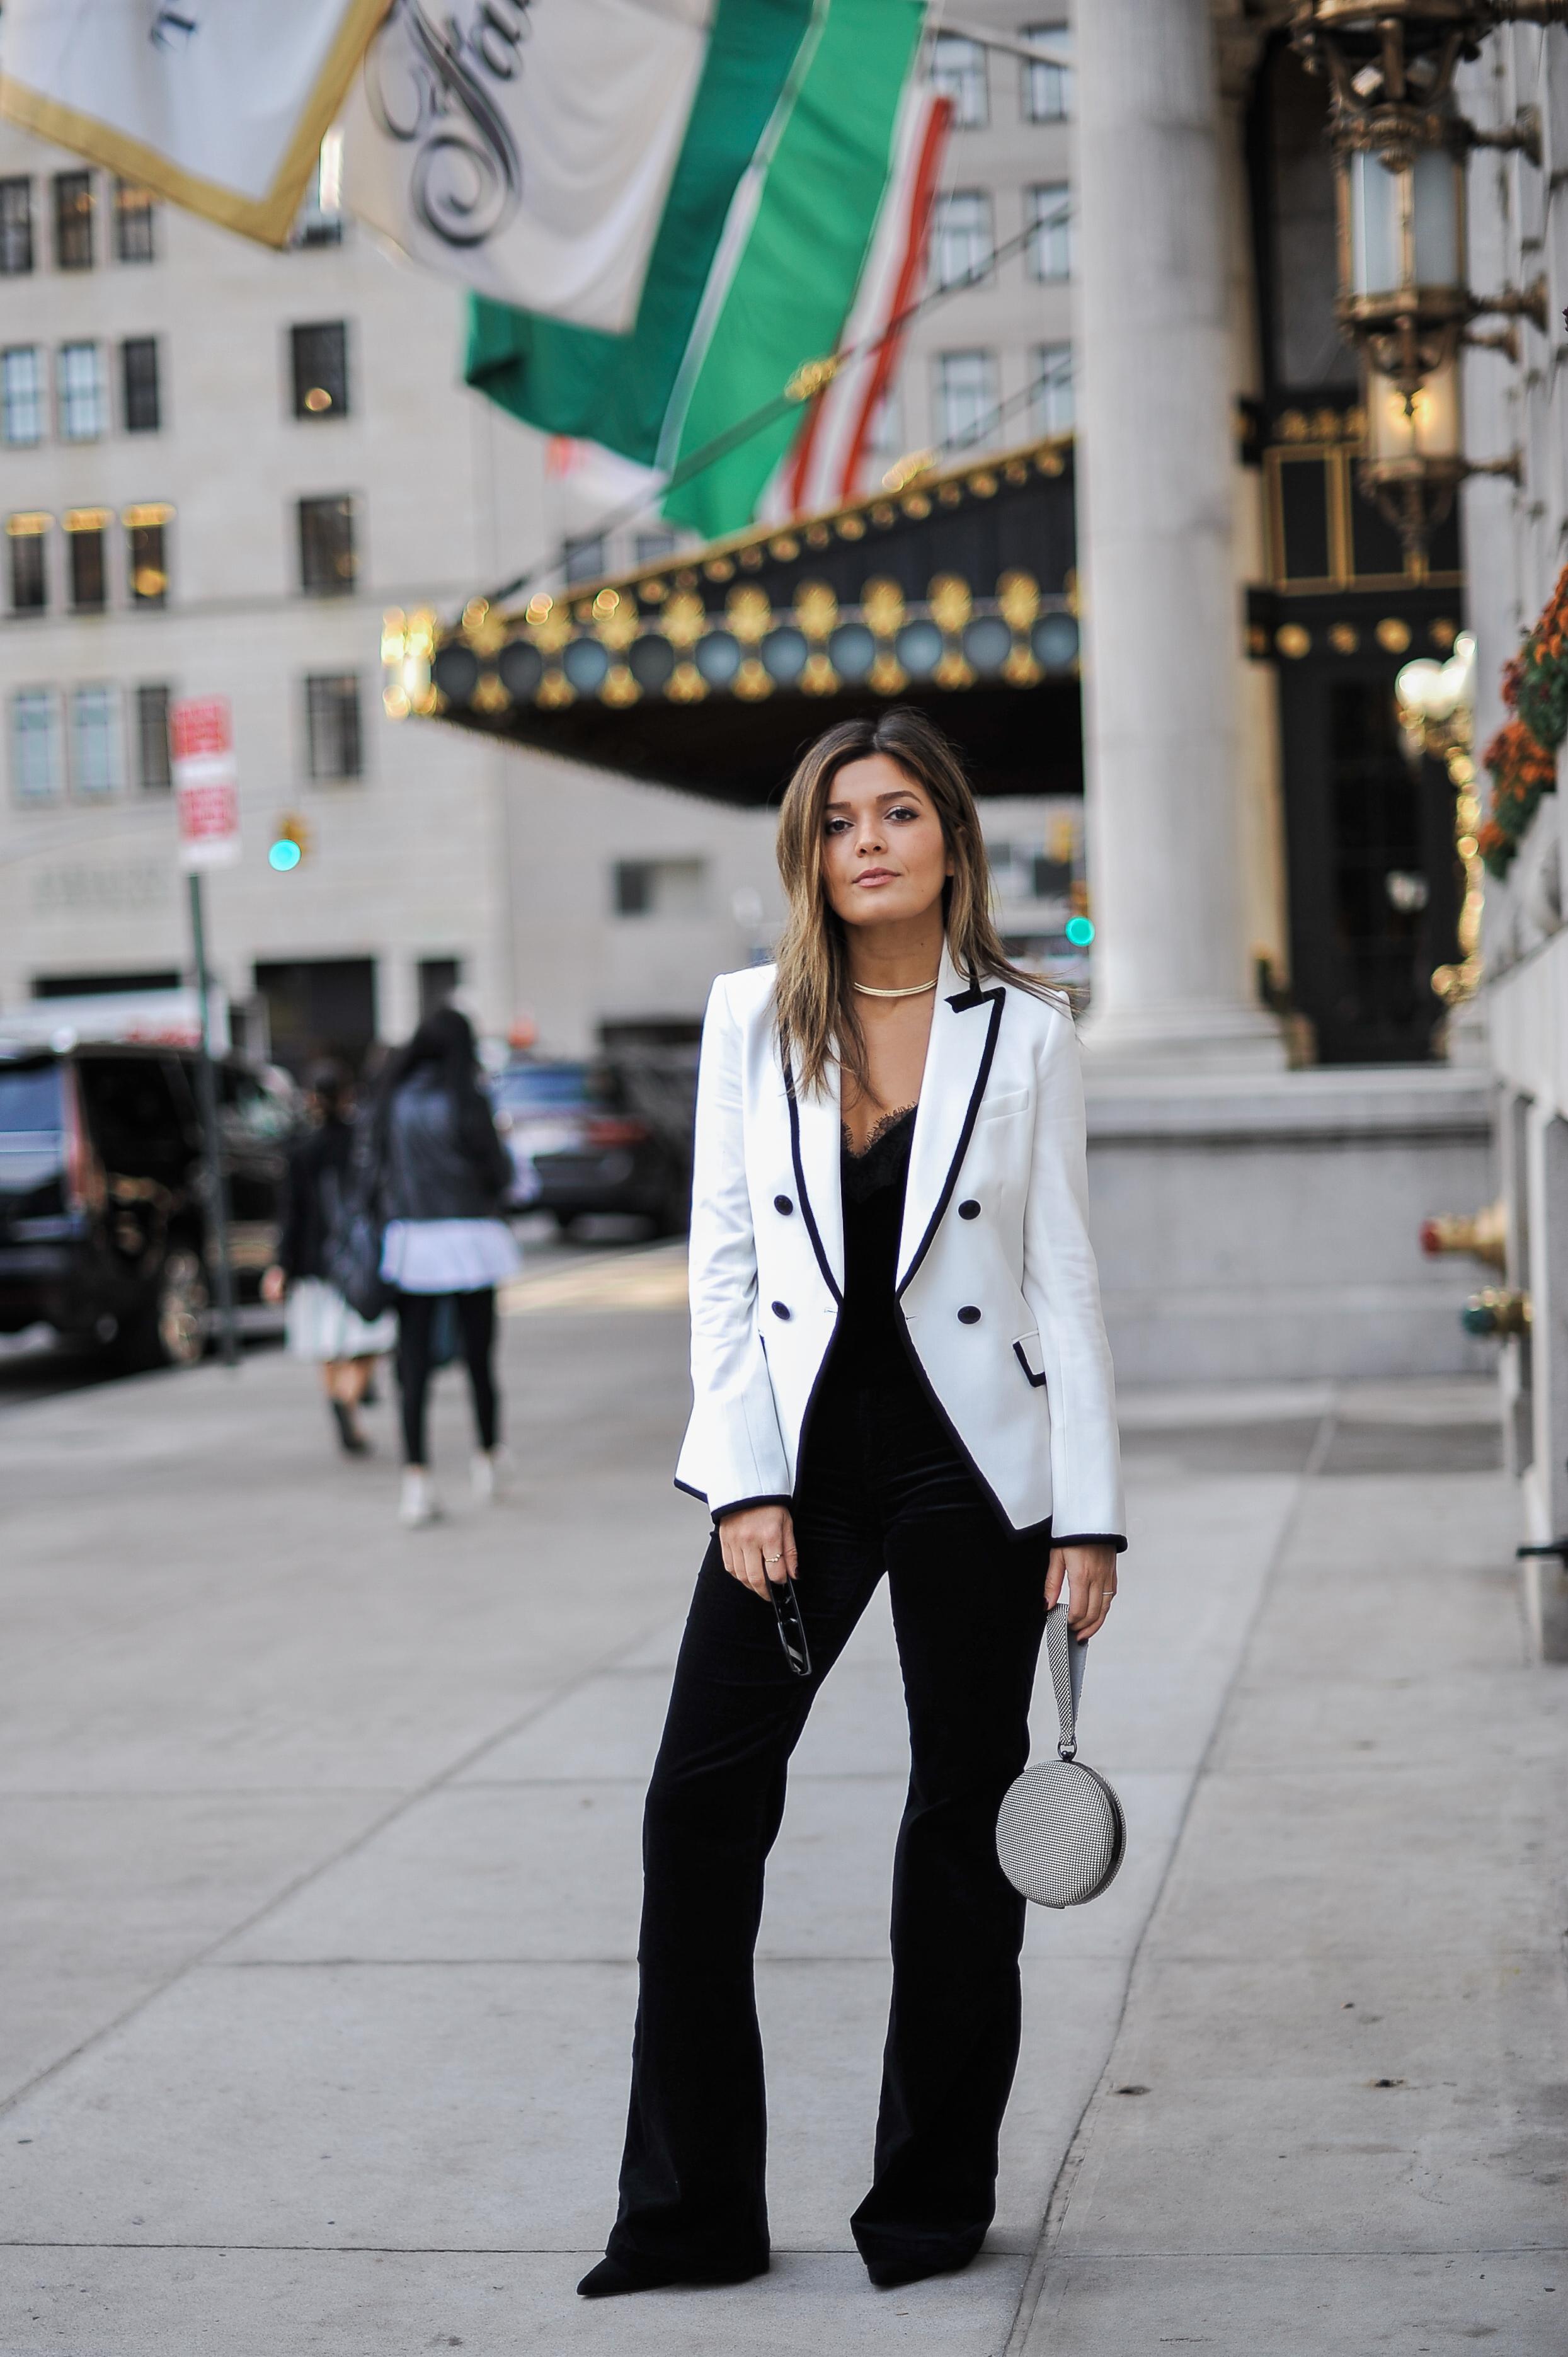 Style MBA Wears Nordstrom Blazer